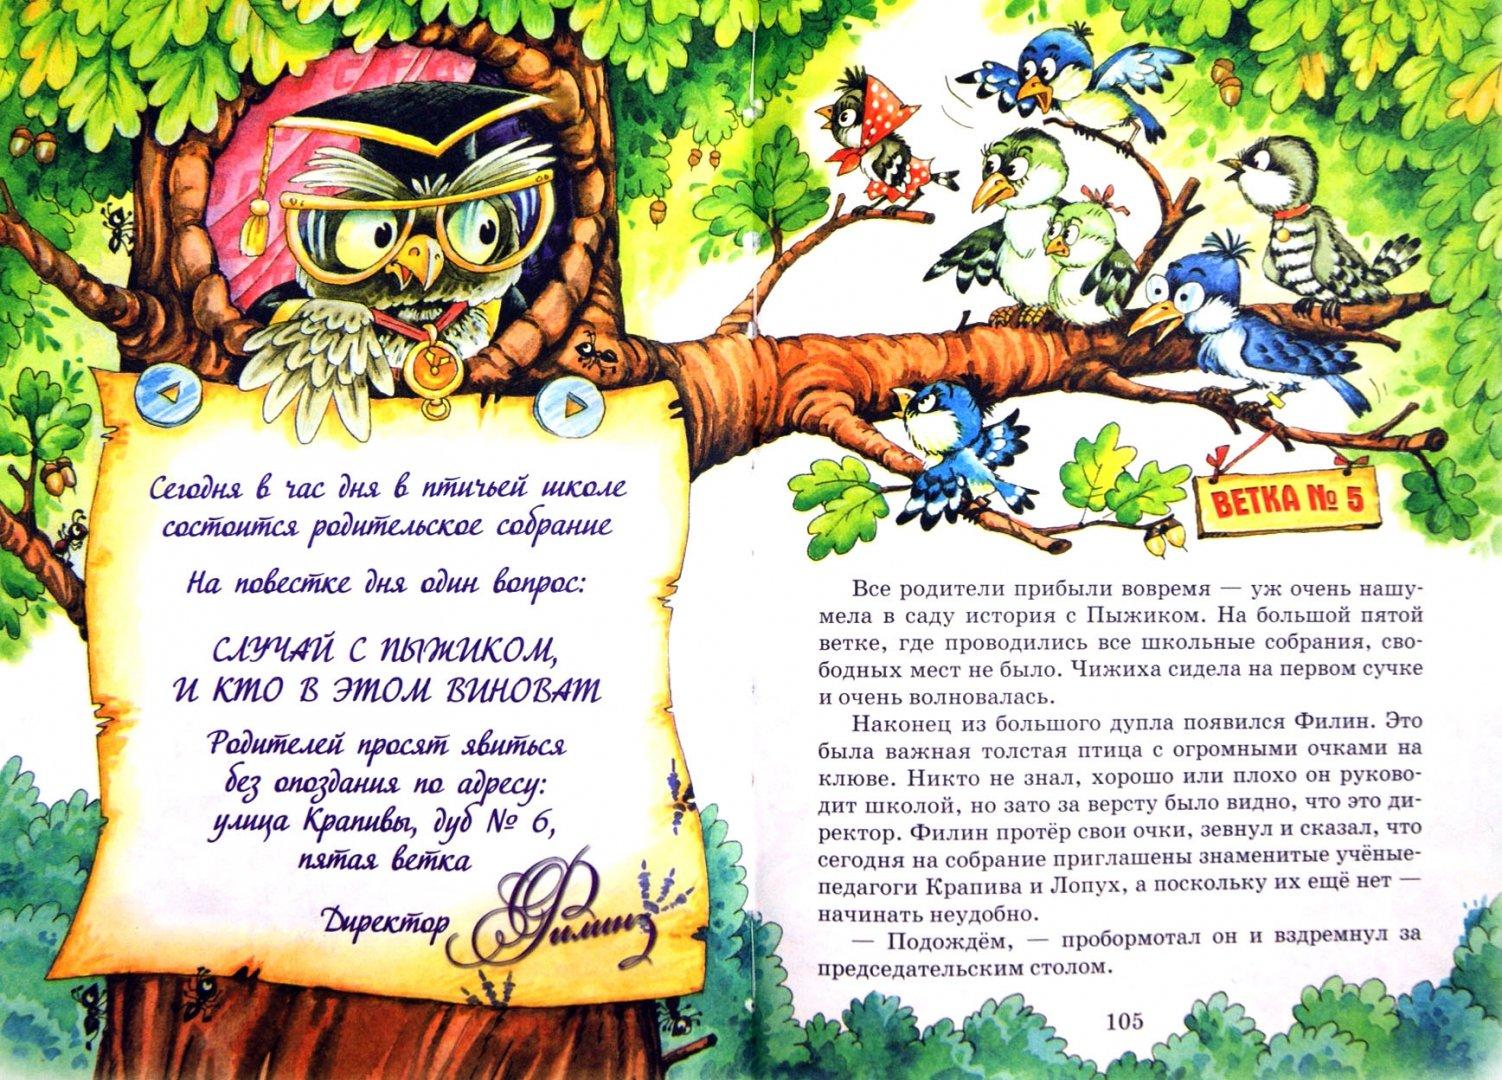 Иллюстрация 1 из 22 для Приключения шахматного солдата Пешкина - Ефим Чеповецкий   Лабиринт - книги. Источник: Лабиринт